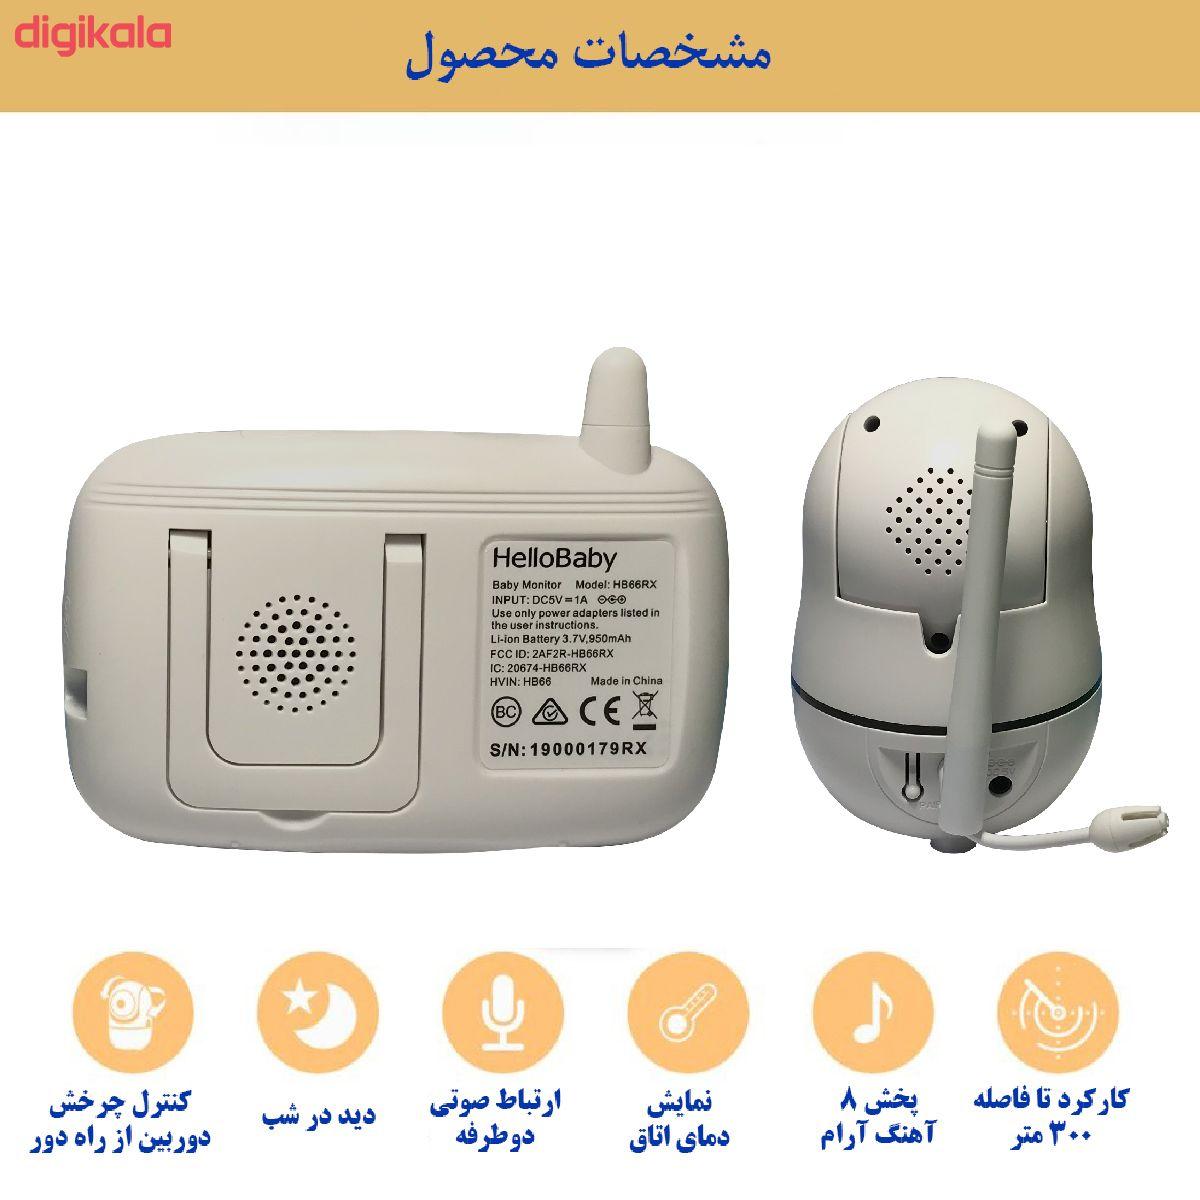 دوربین کنترل کودک هلوبیبی مدل HB66 main 1 1